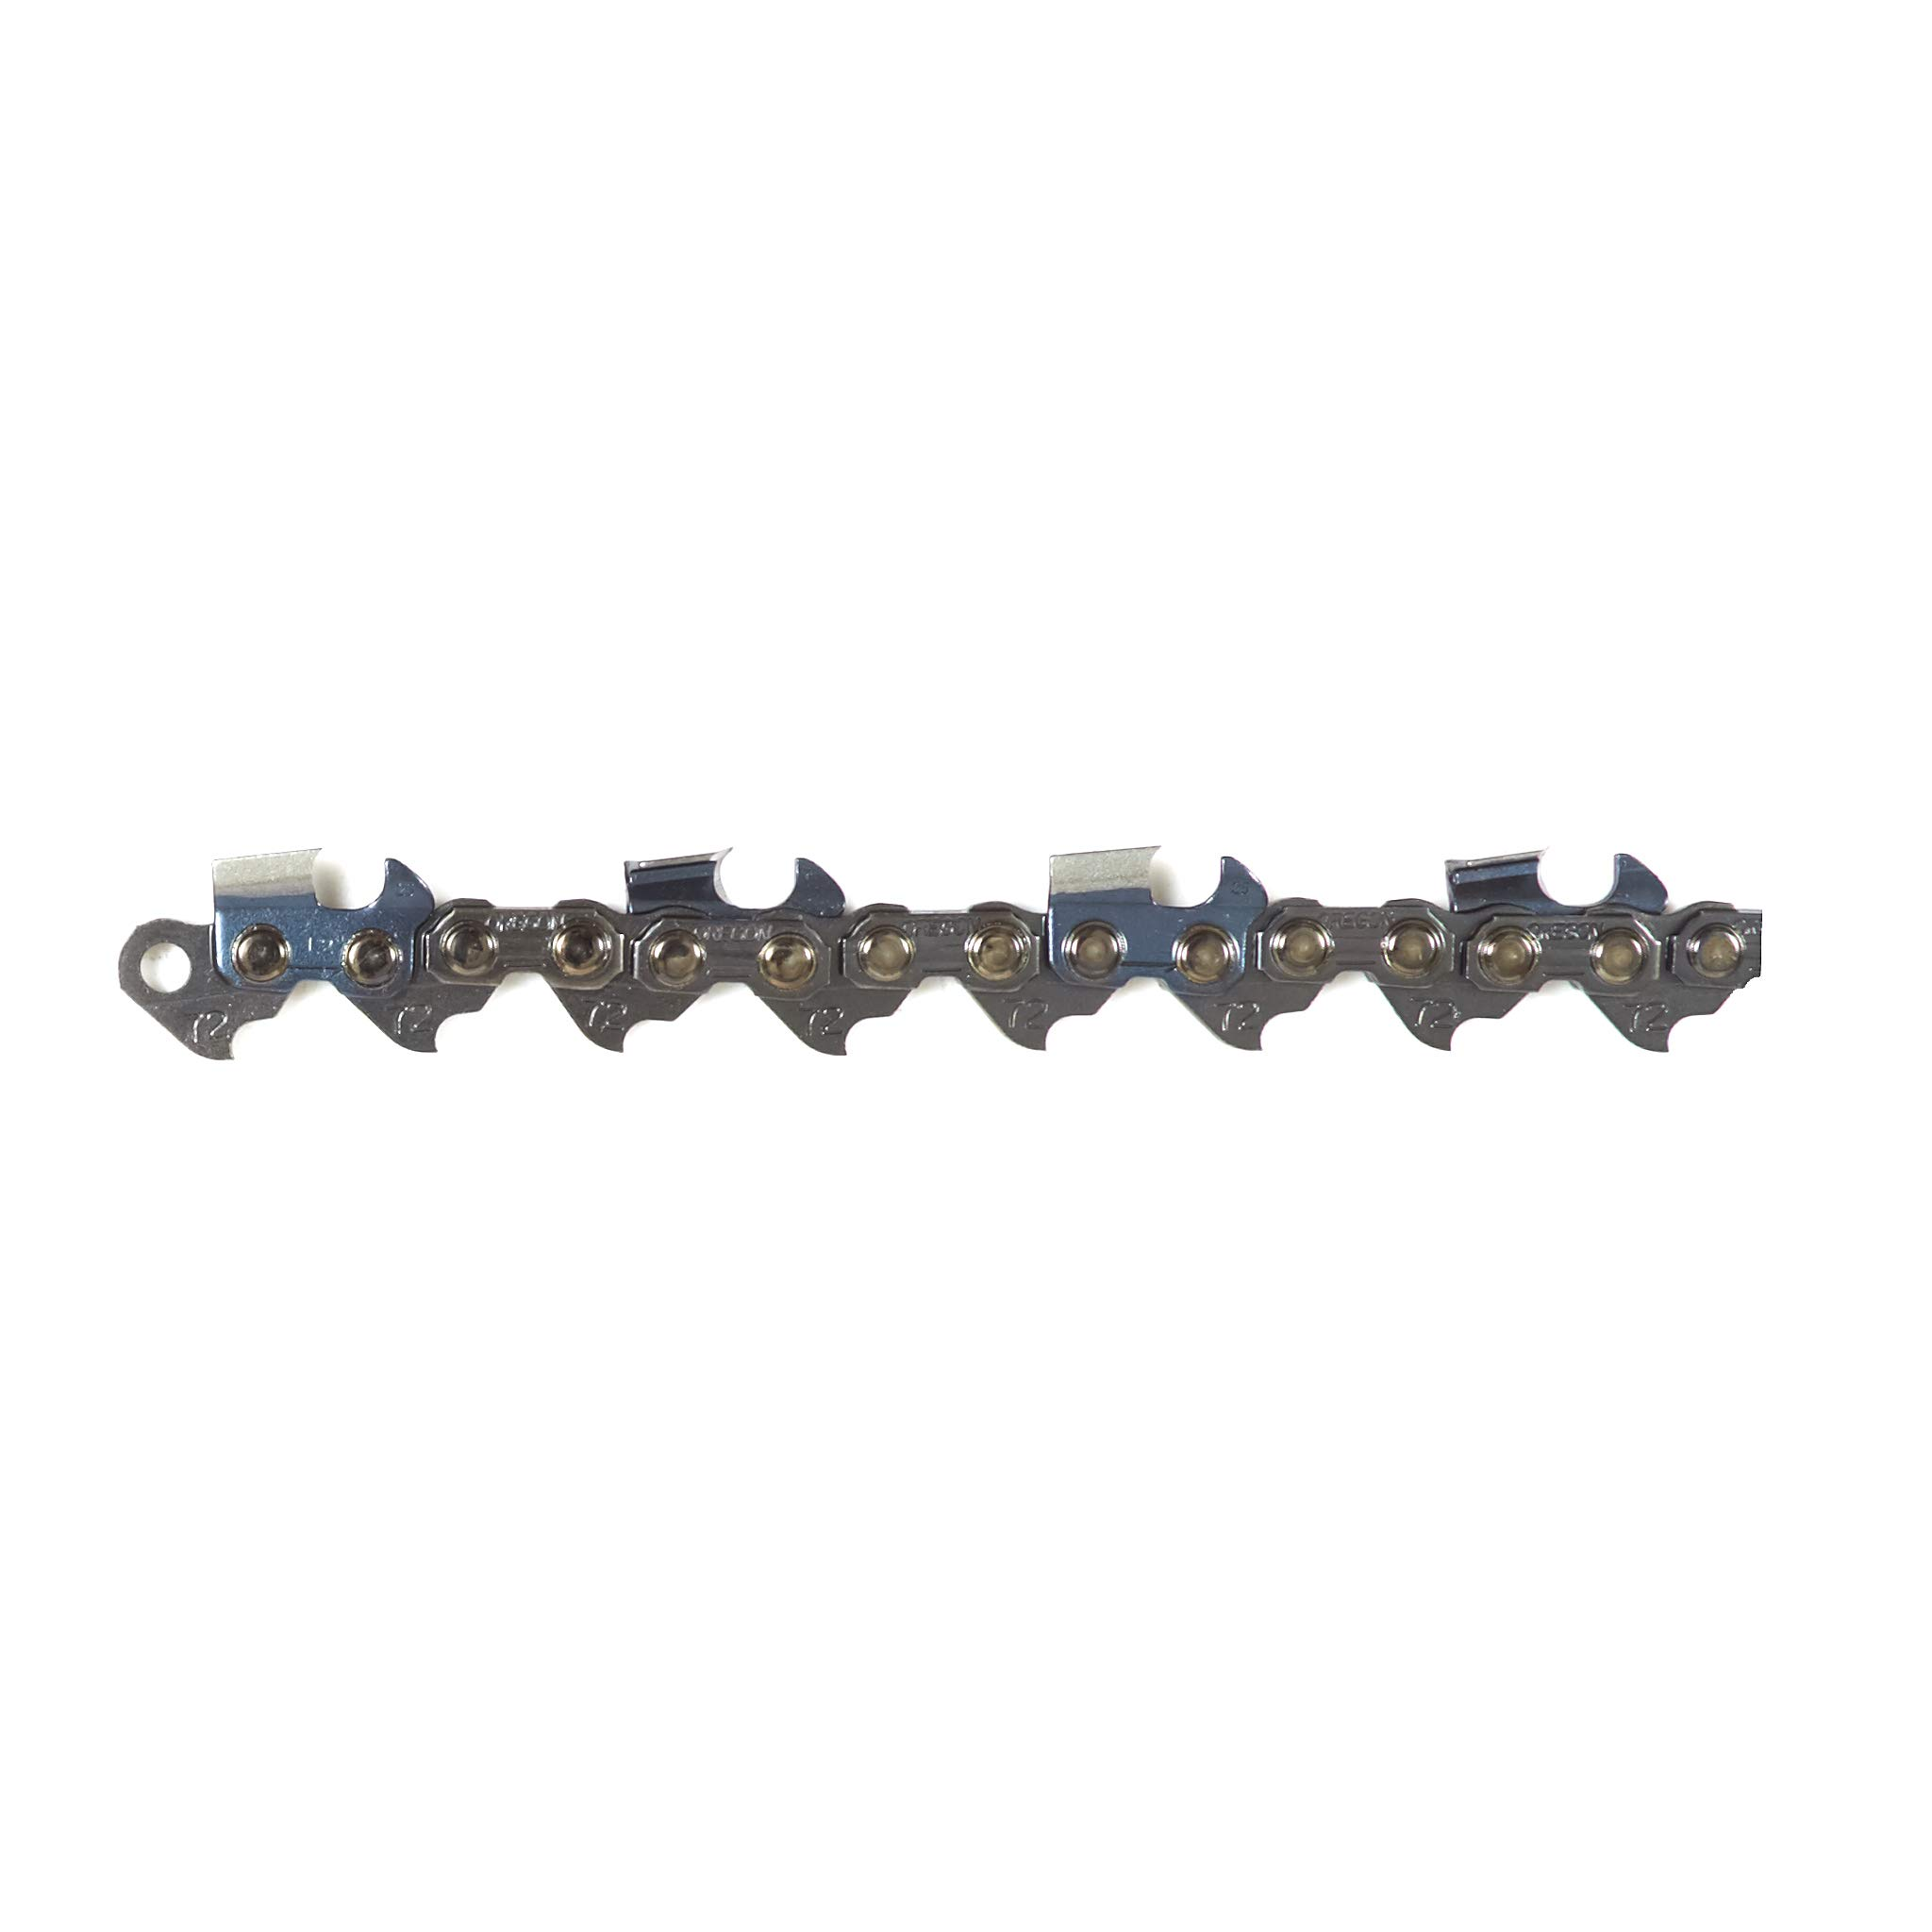 Oregon 73LGX100U PowerCut Saw Chain, 100' Reel